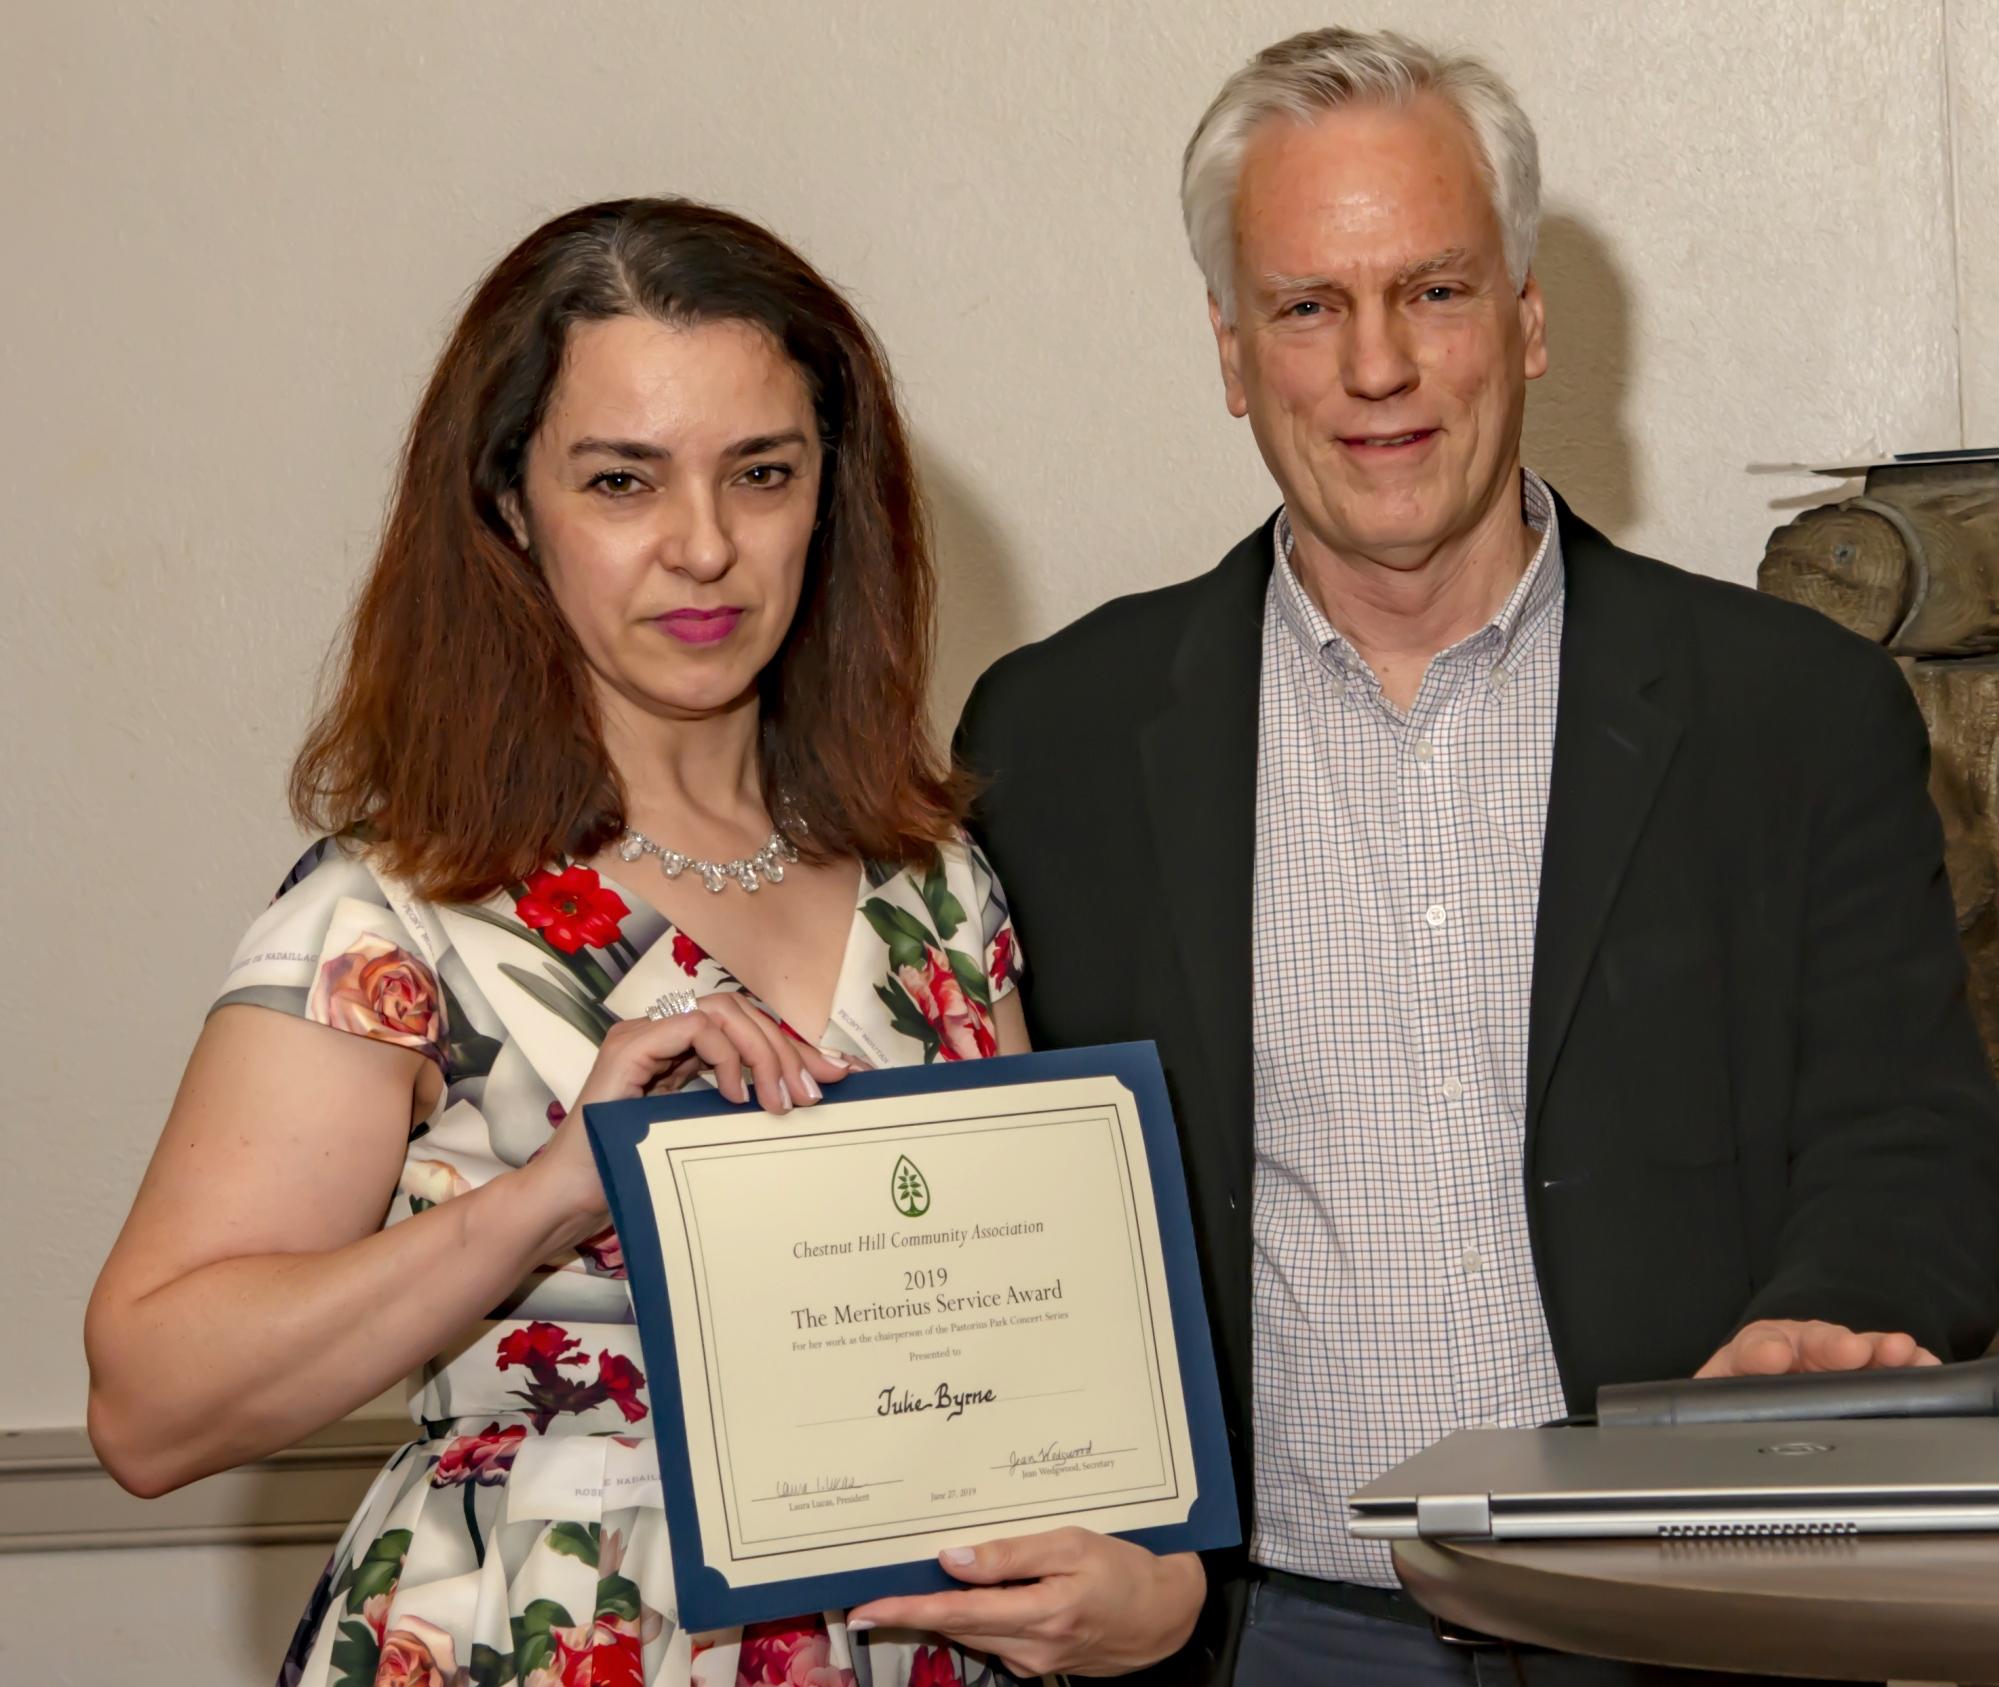 Meritorius Service Award